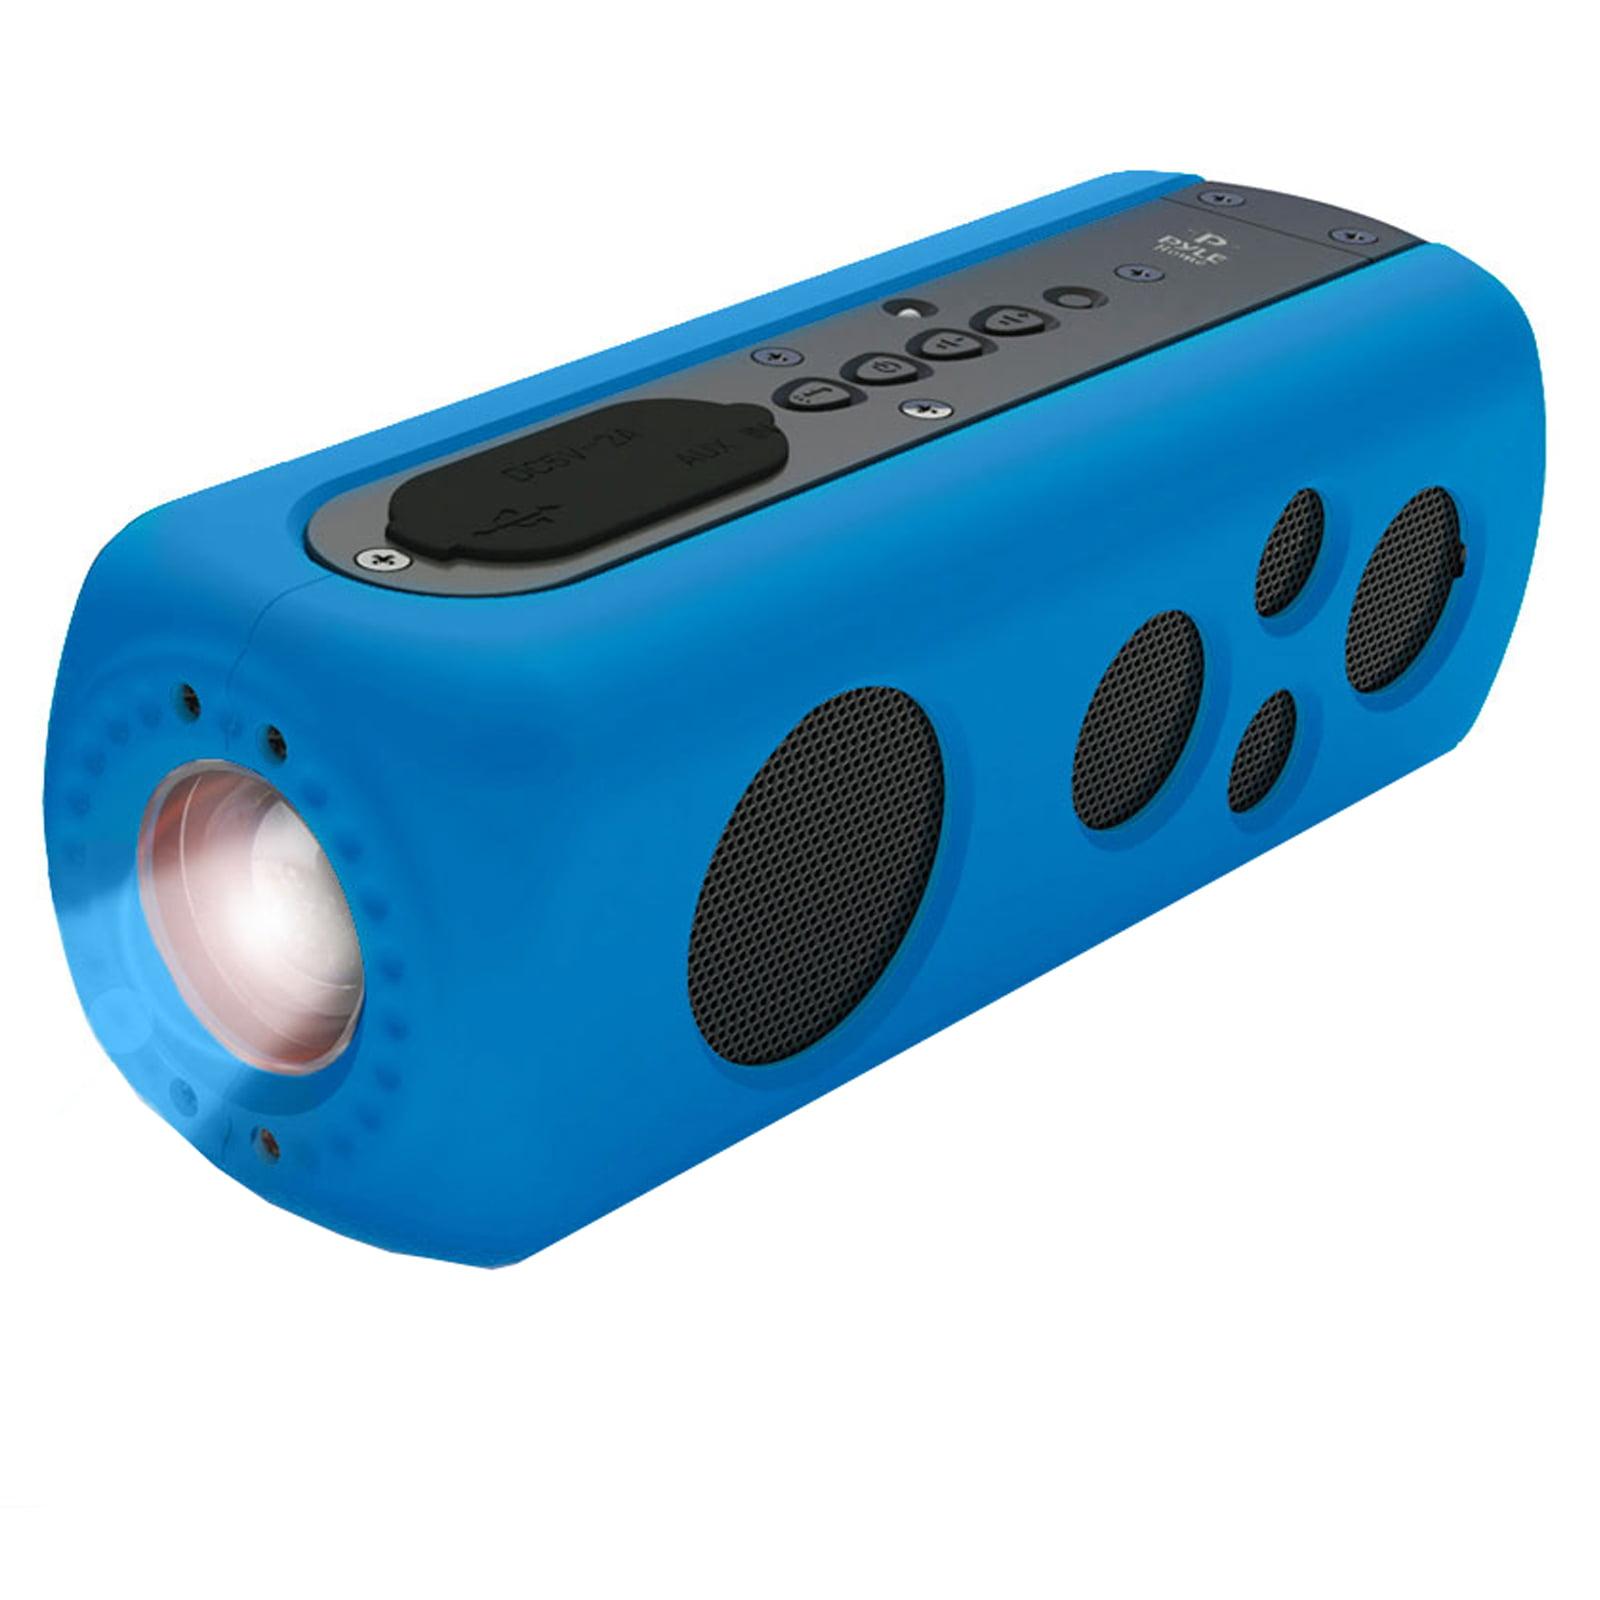 SoundBox Splash 2 BT Rugged and Splash-Proof Speaker System with Built-in LED Flashlight, Hand Crank Turbine er and AUX Input (Blue Color)